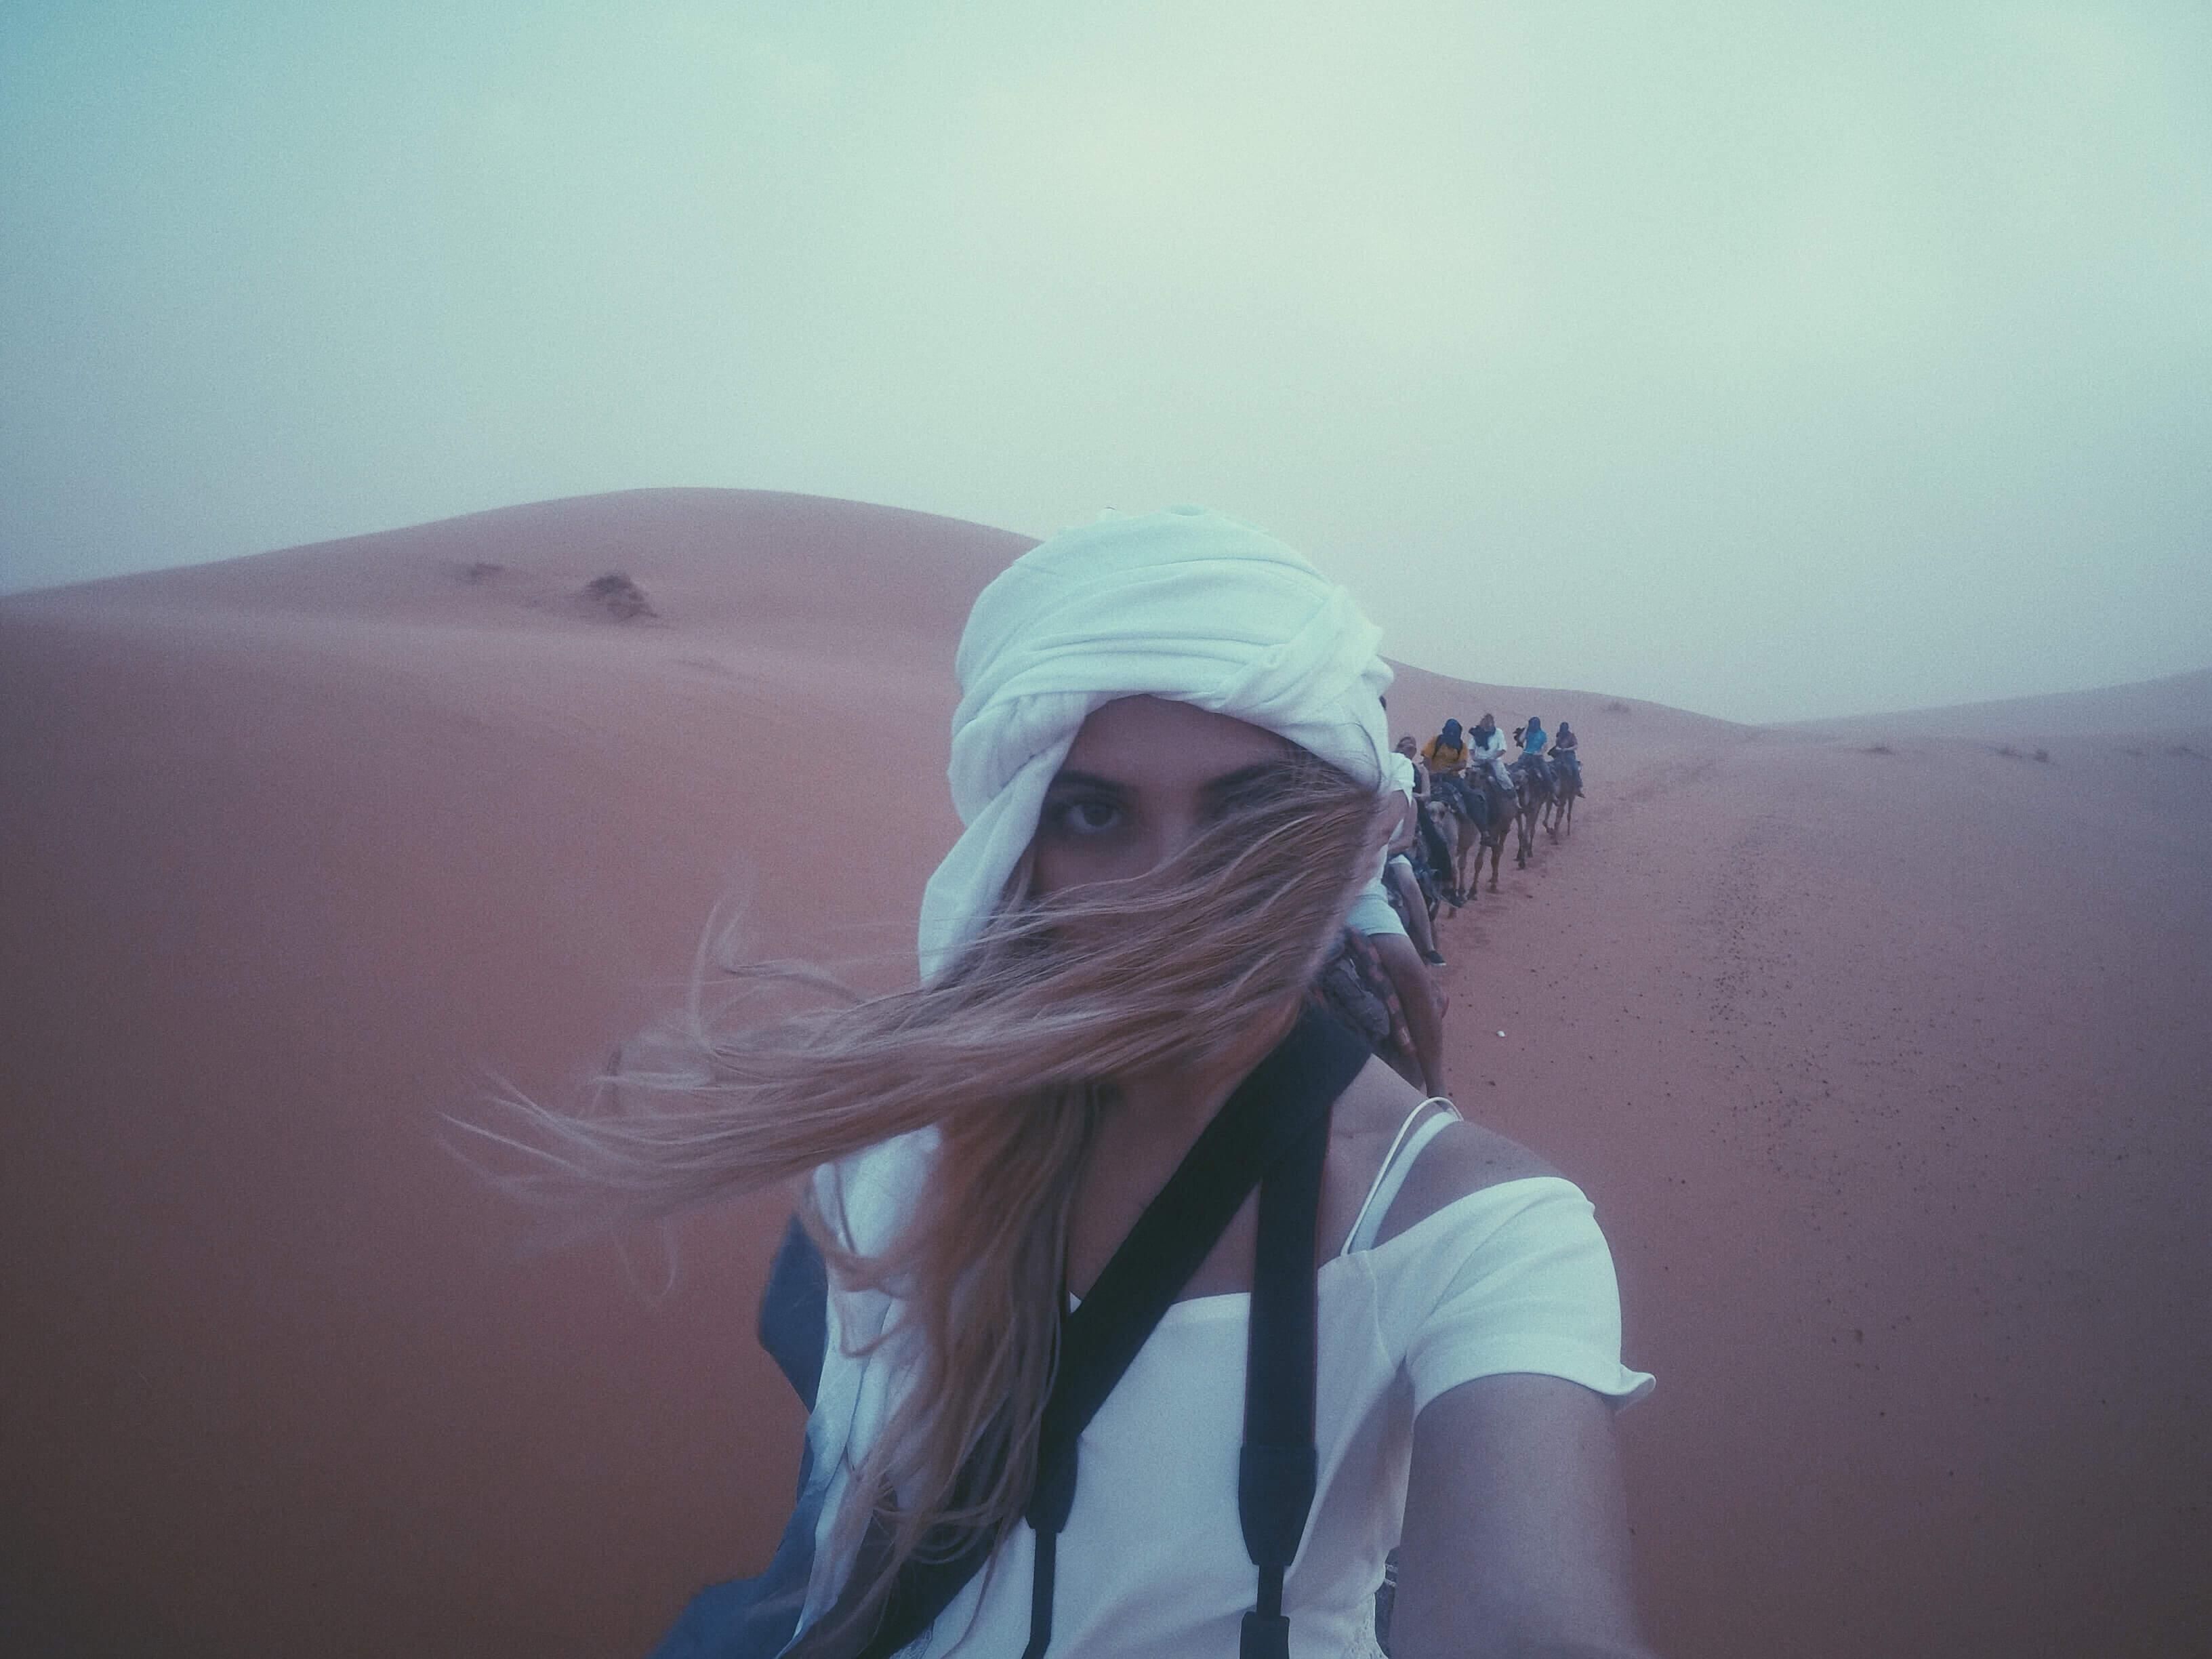 Camel riding in the Sahara desert in Morocco